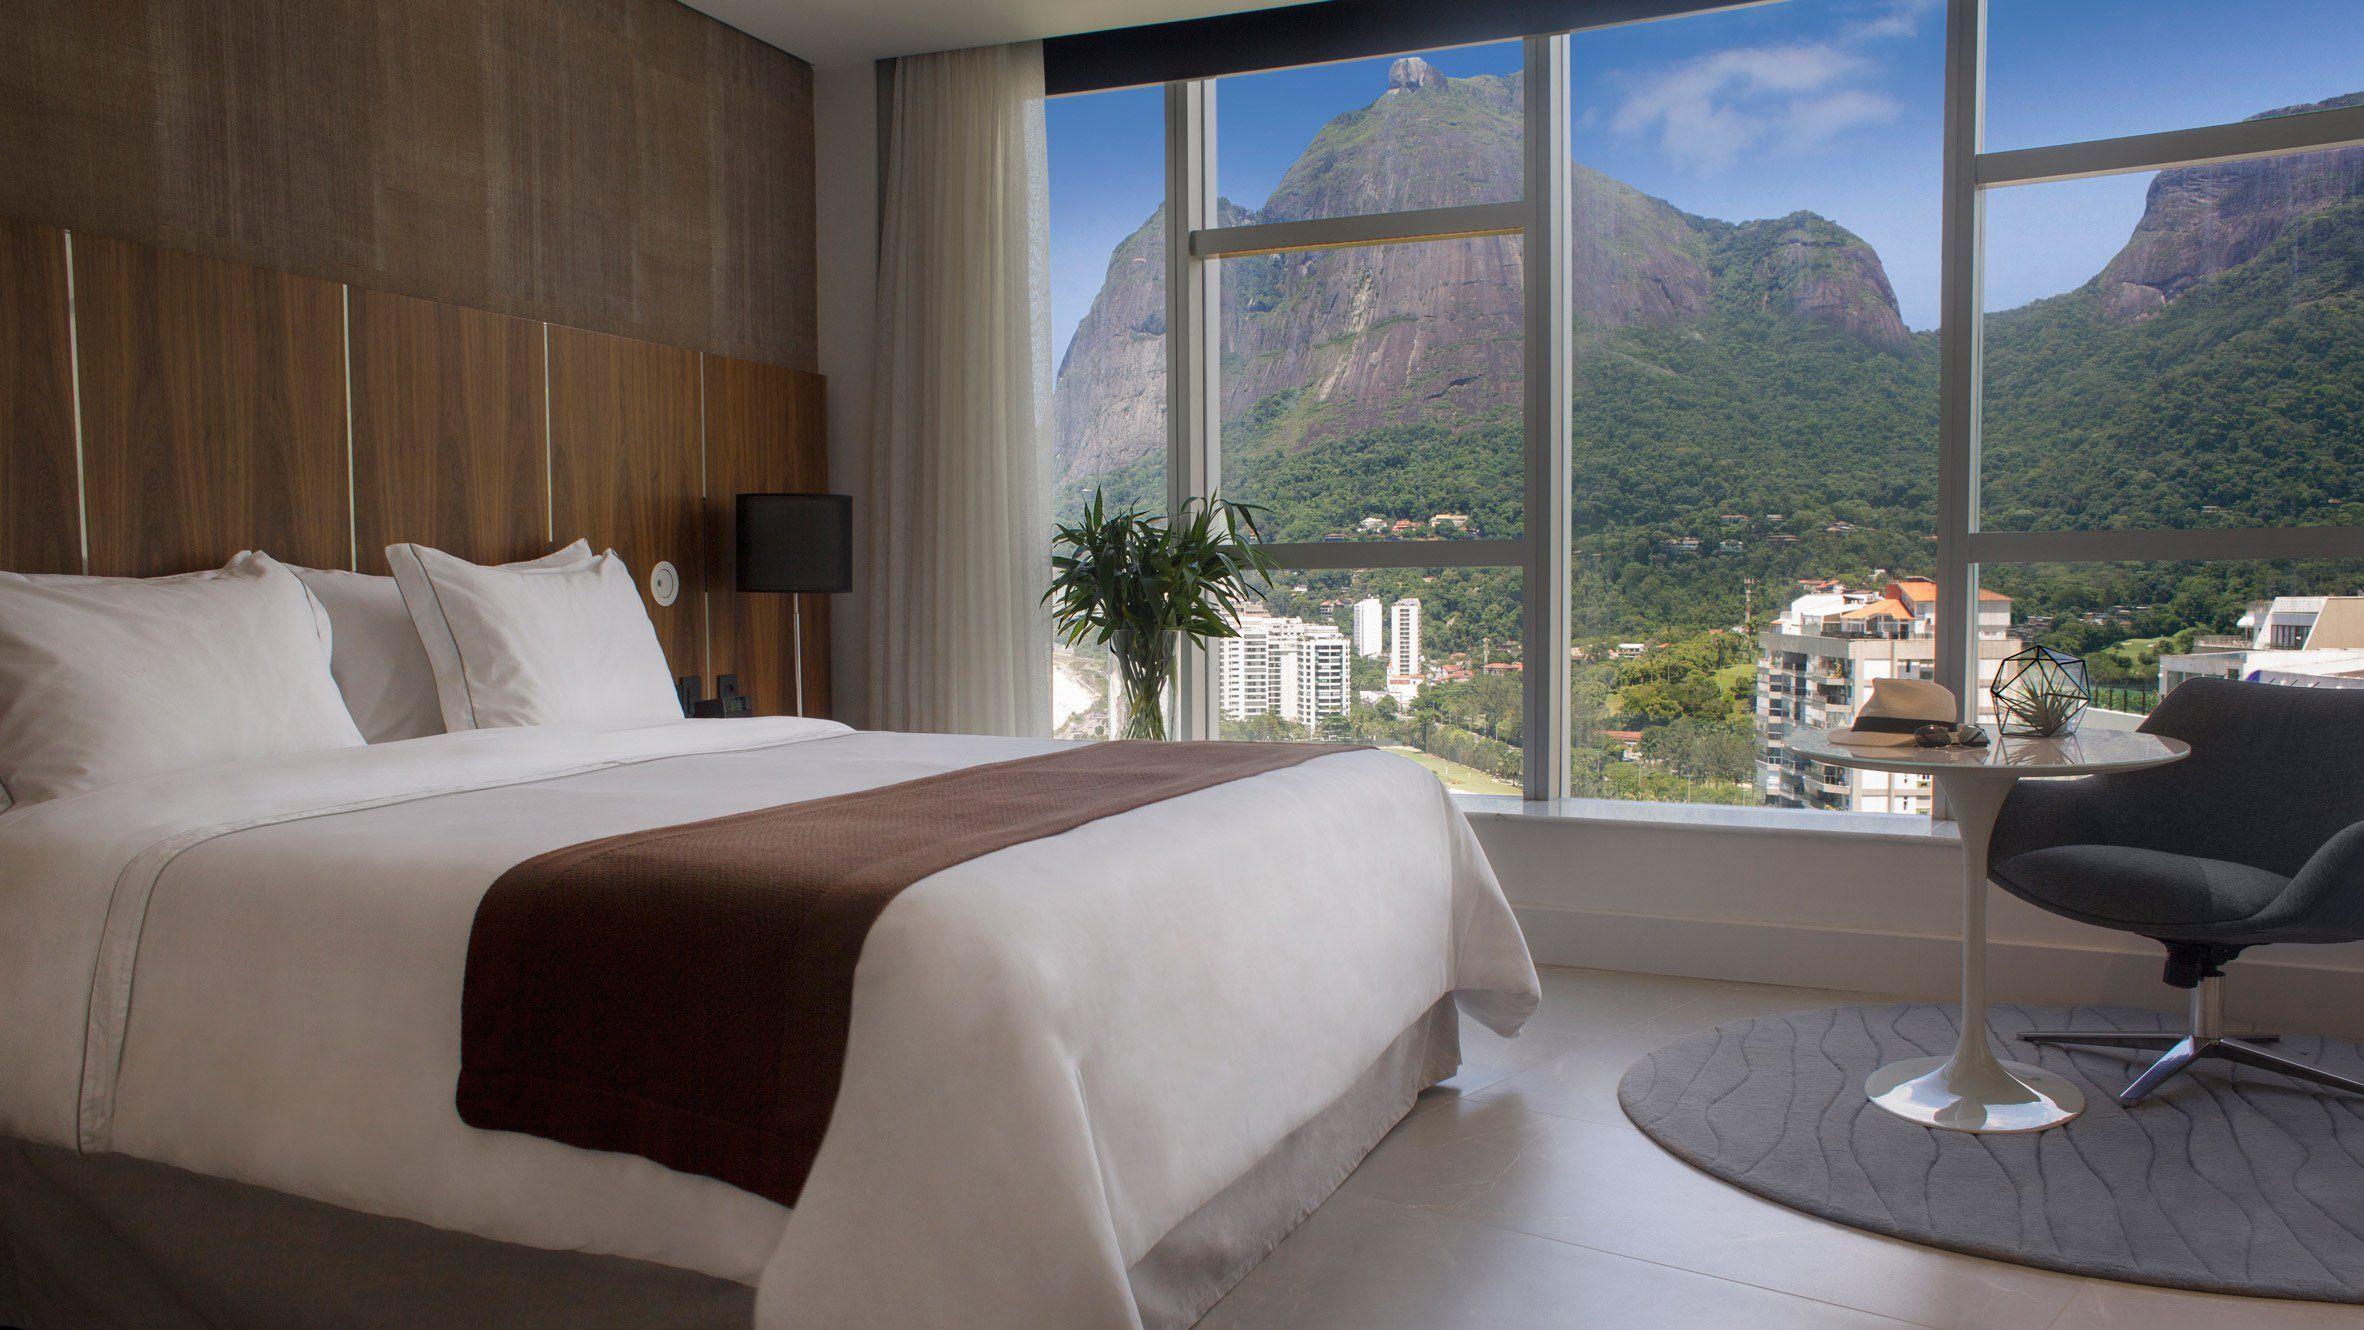 Oscar Niemeyer's recently reopened Hotel Nacional in Rio de Janeiro features reworked interiors by Brazilian firm Debora Aguiar Arquitectos and US practice Studio VOA.